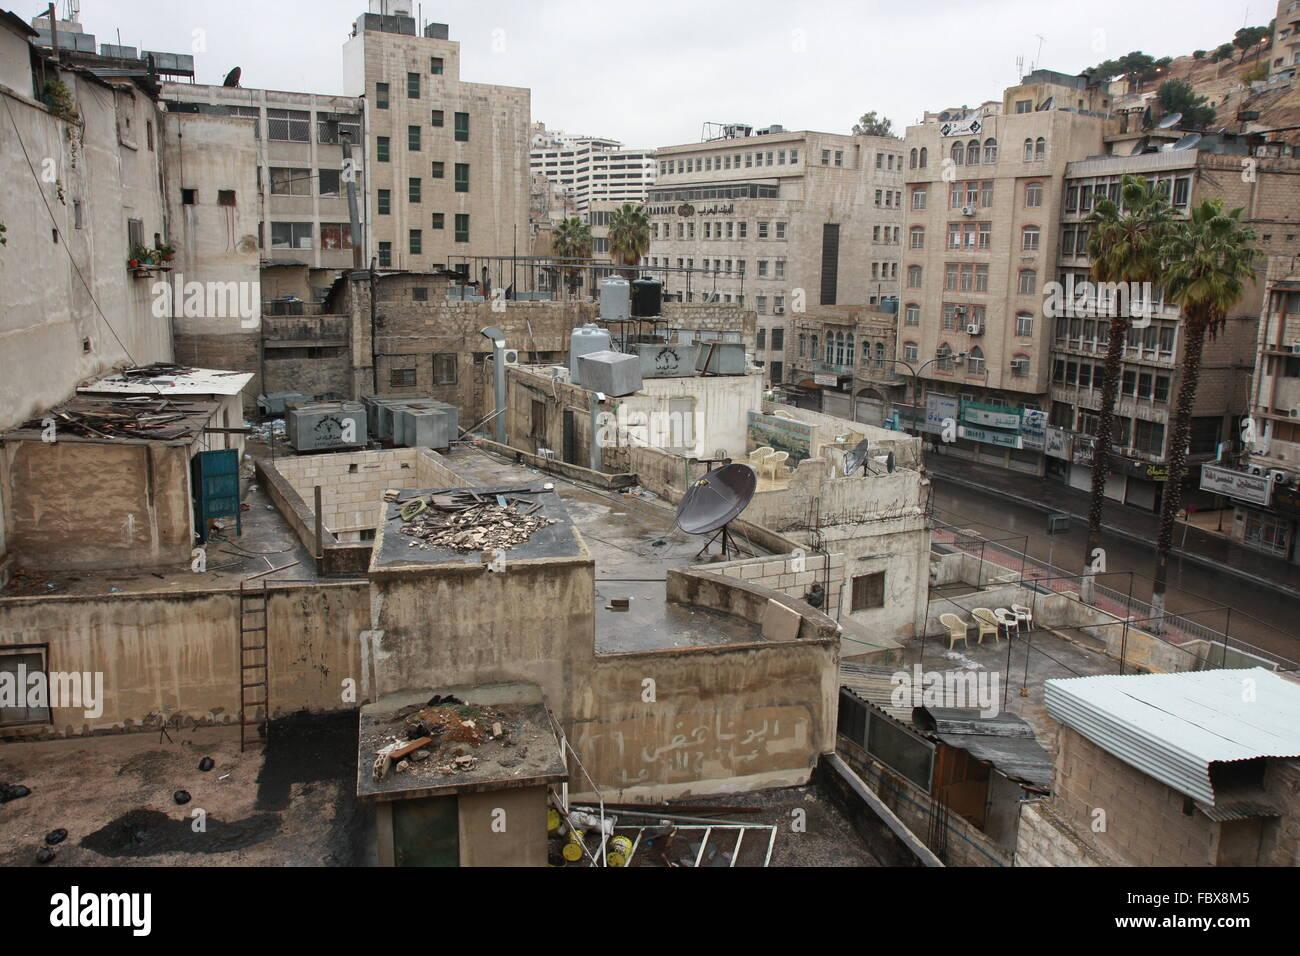 Amman Immagini Stock